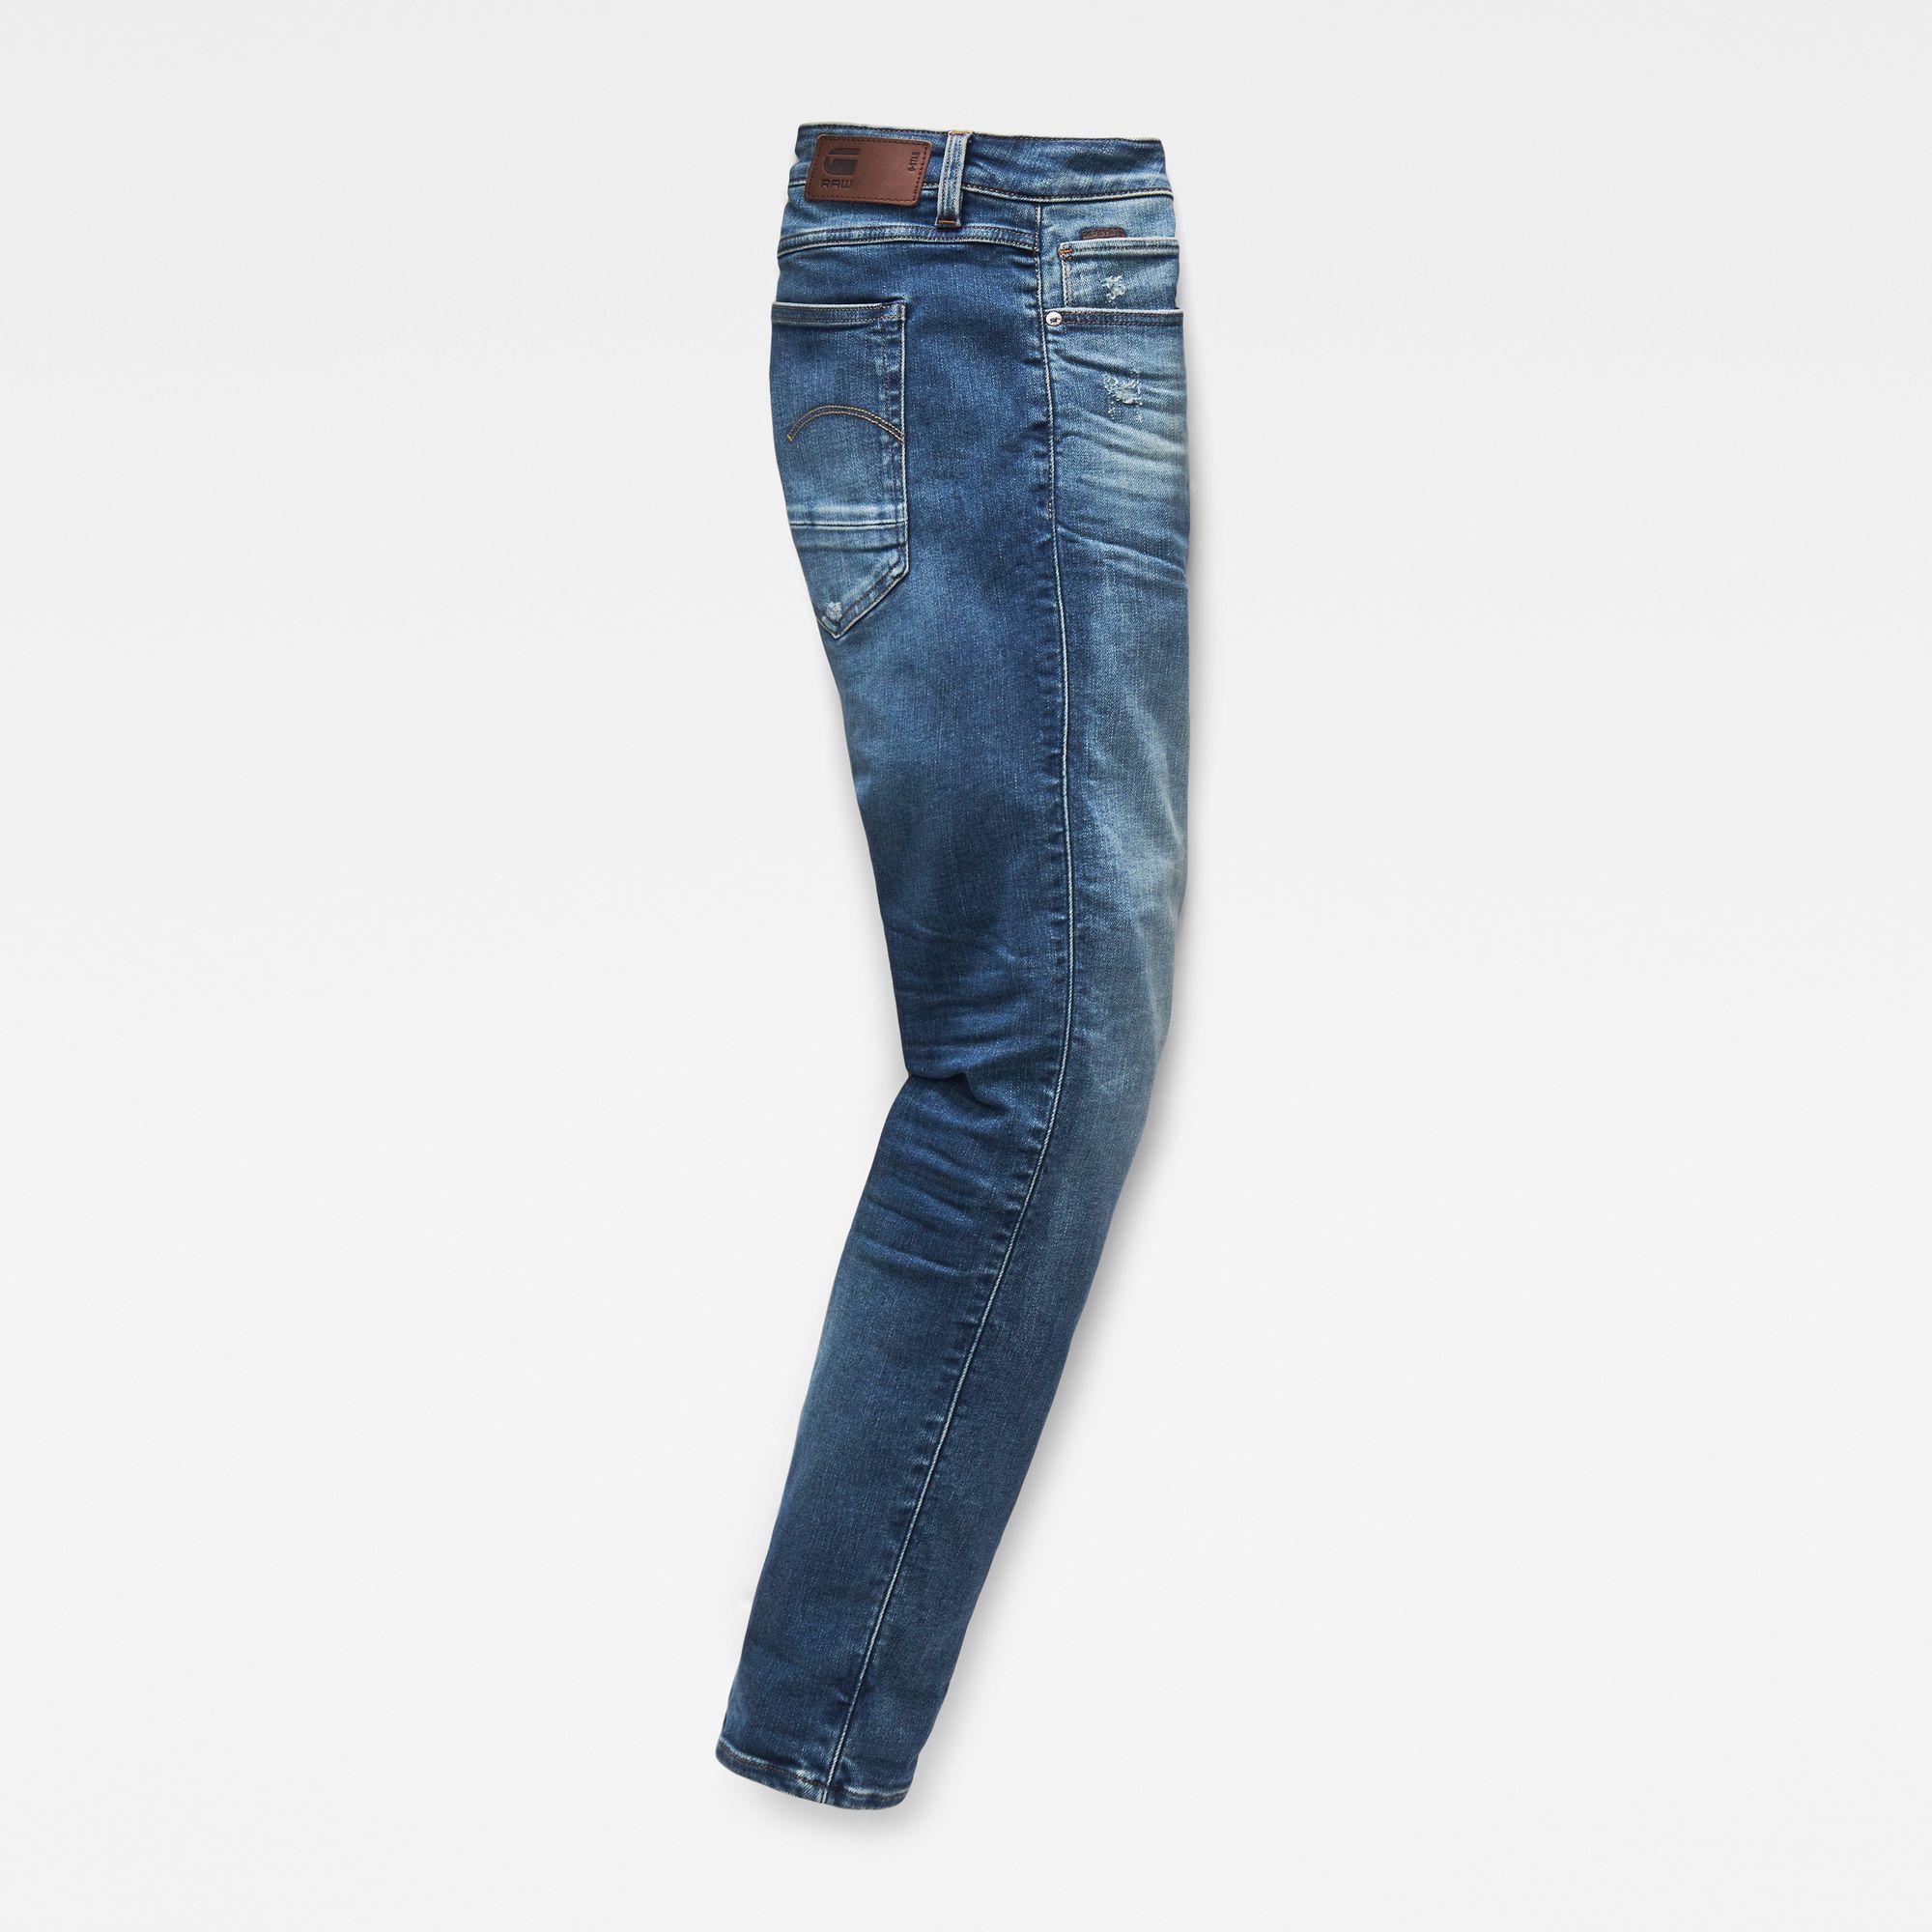 G-Star RAW Kate Boyfriend Jeans